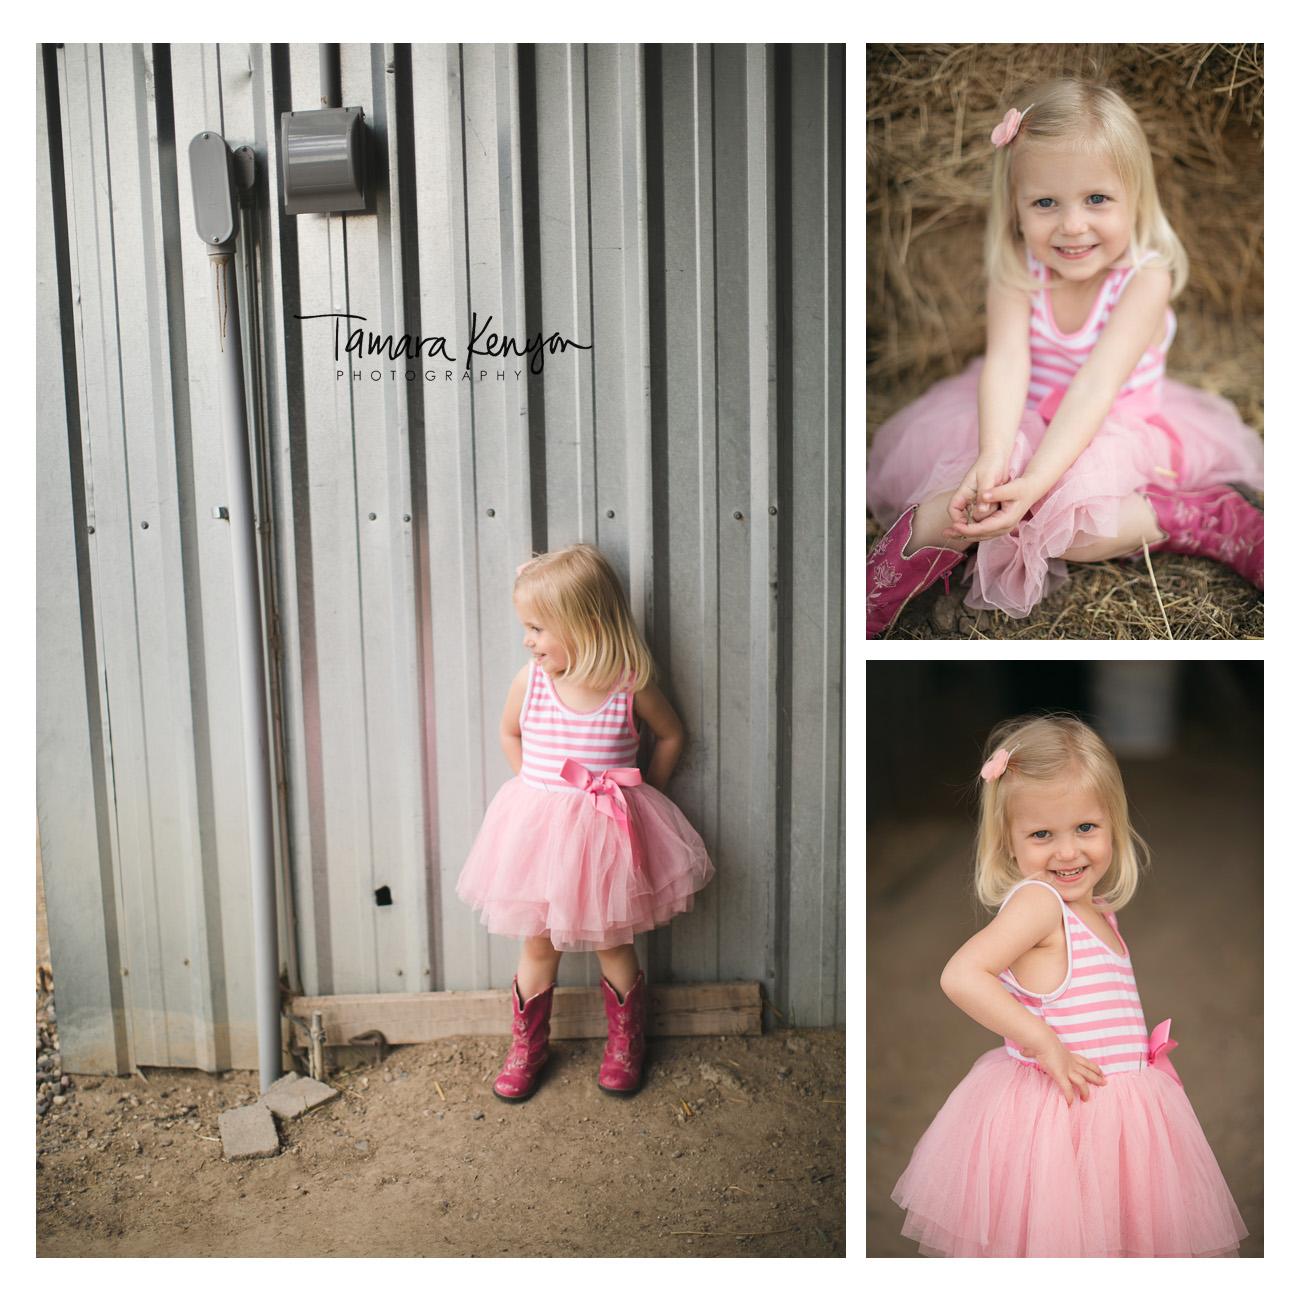 Boise_Country_Little_Girl